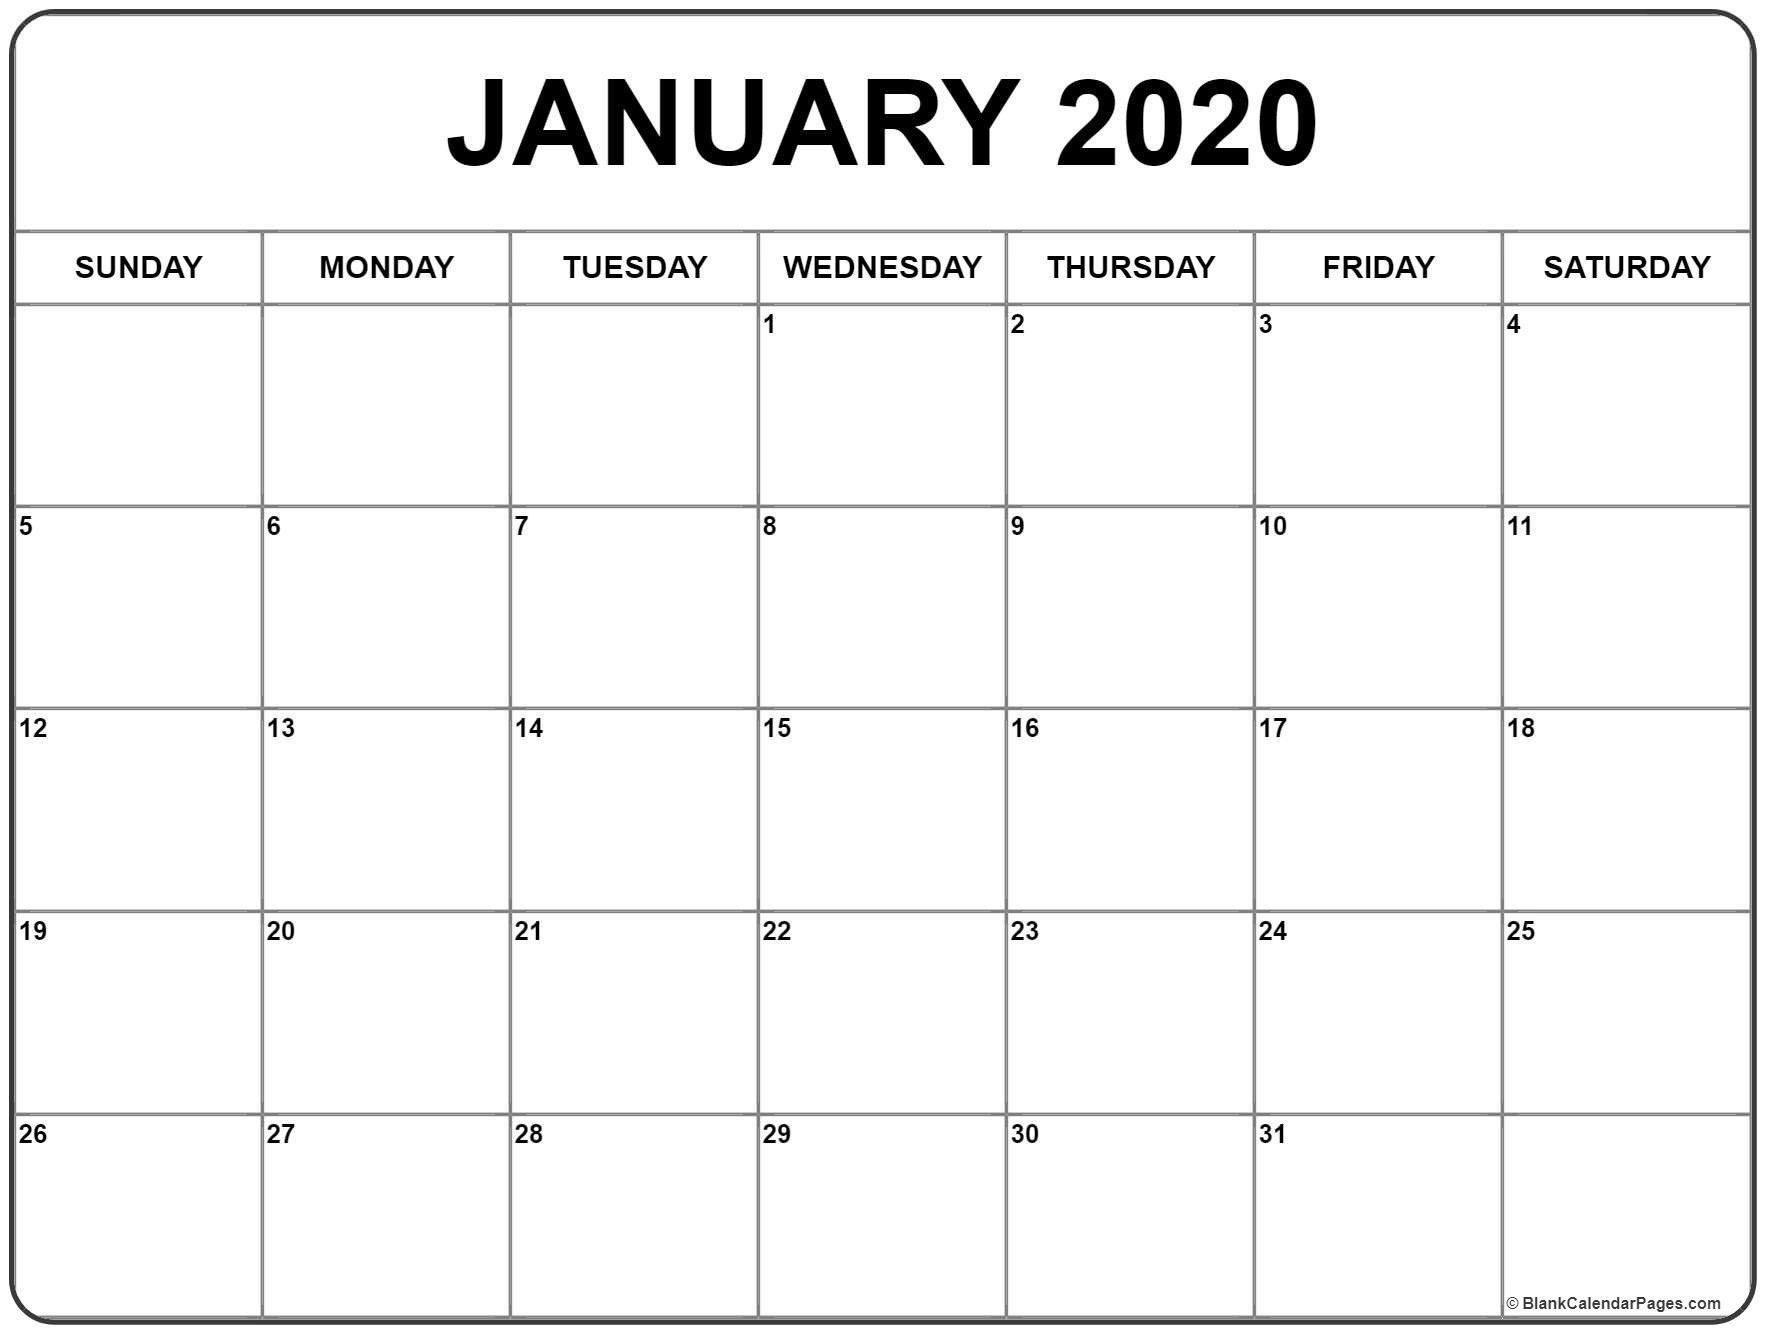 January Calendar 2020 Template - Togo.wpart.co